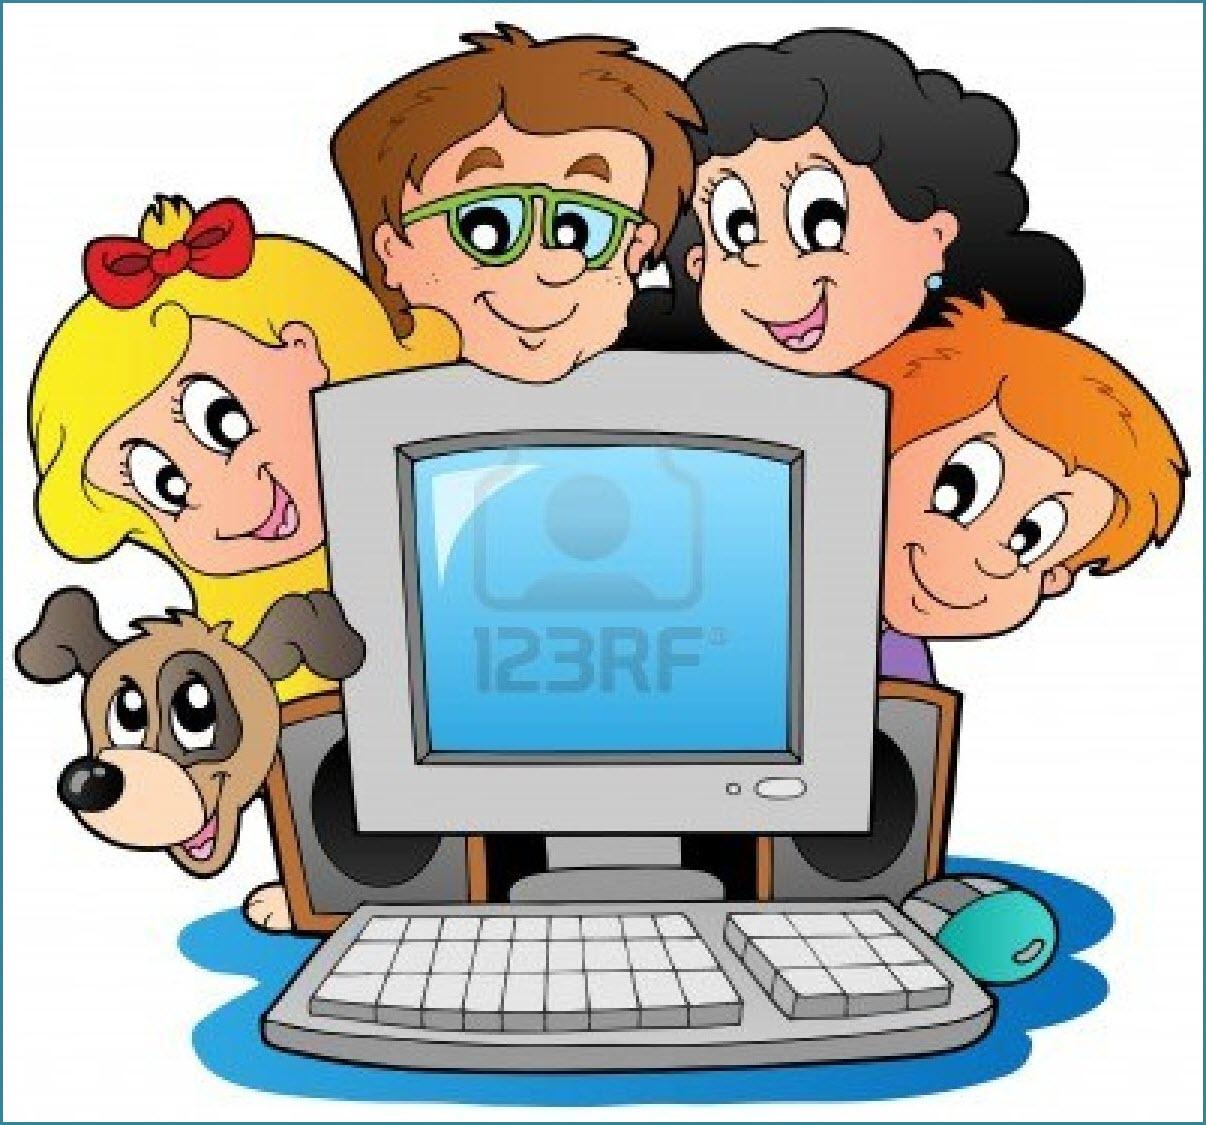 На картинке дети, родители, собака и компьютер